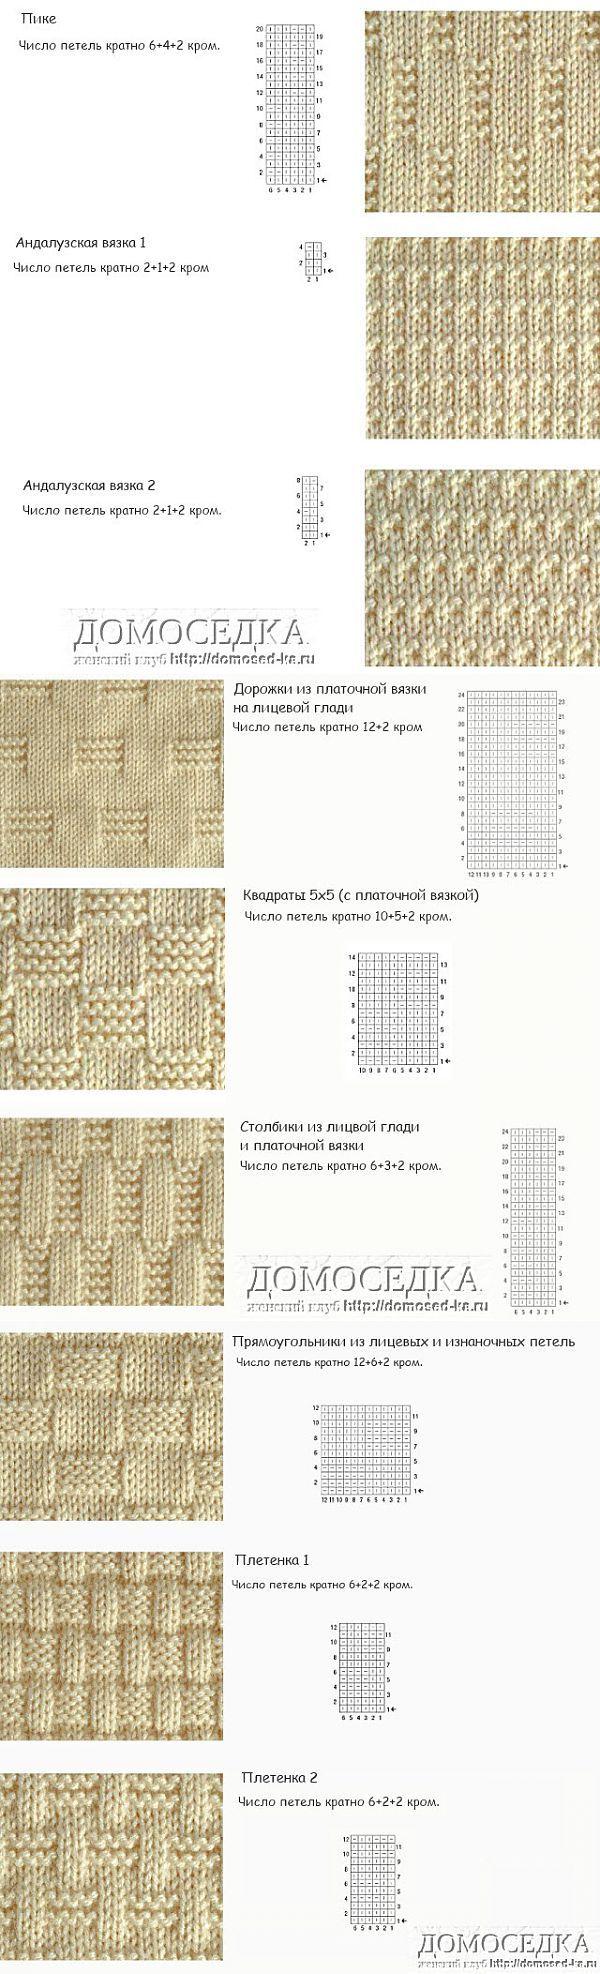 вязание-узоры | Patrones simples, Radios y Patrones